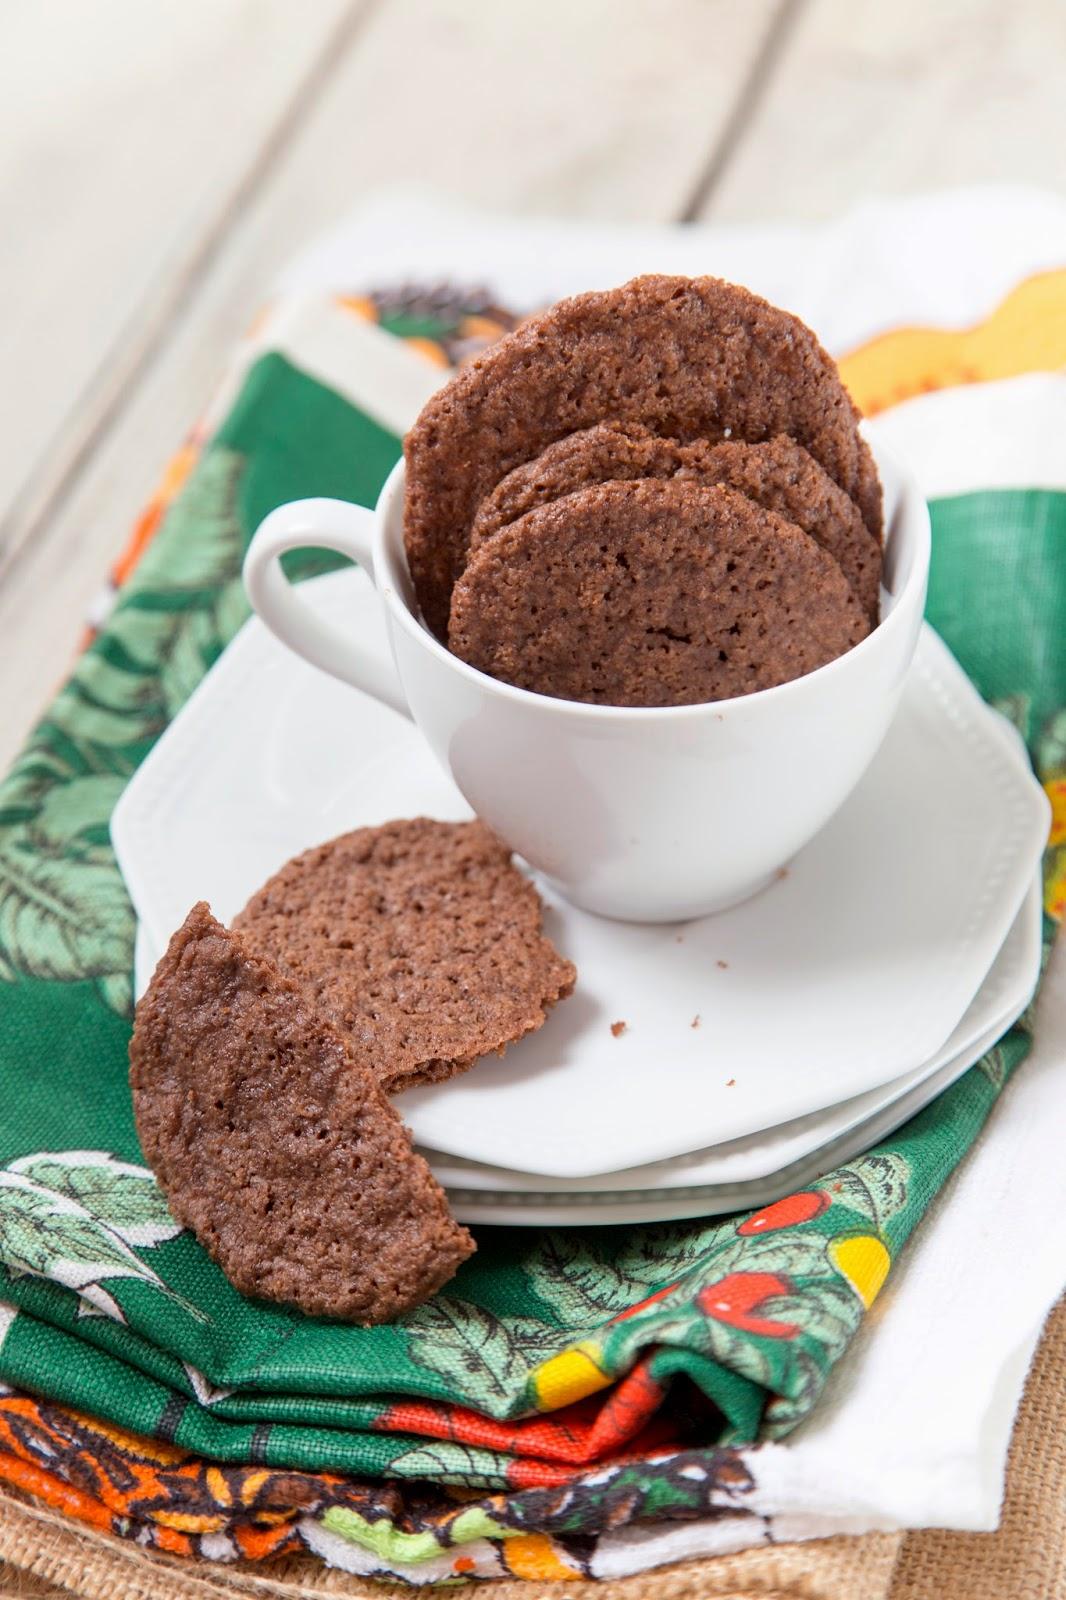 Cookies sin gluten, galletas sin gluten, galletas de chocolate sin gluten